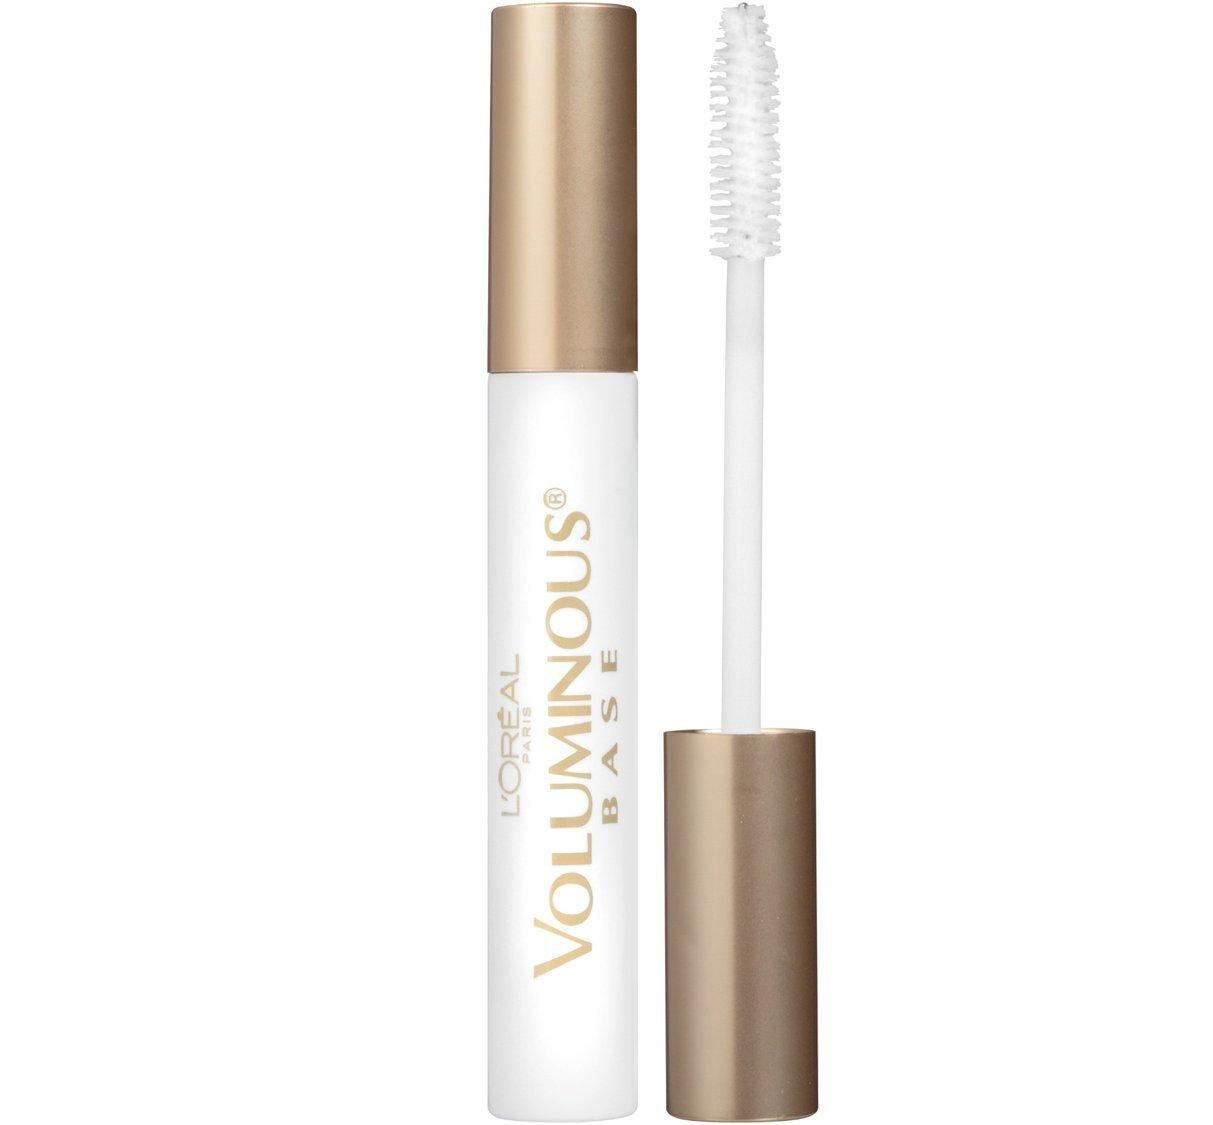 L'Oréal Paris Makeup Same day shipping Voluminous New life Boosting Lash Conditioning Pr